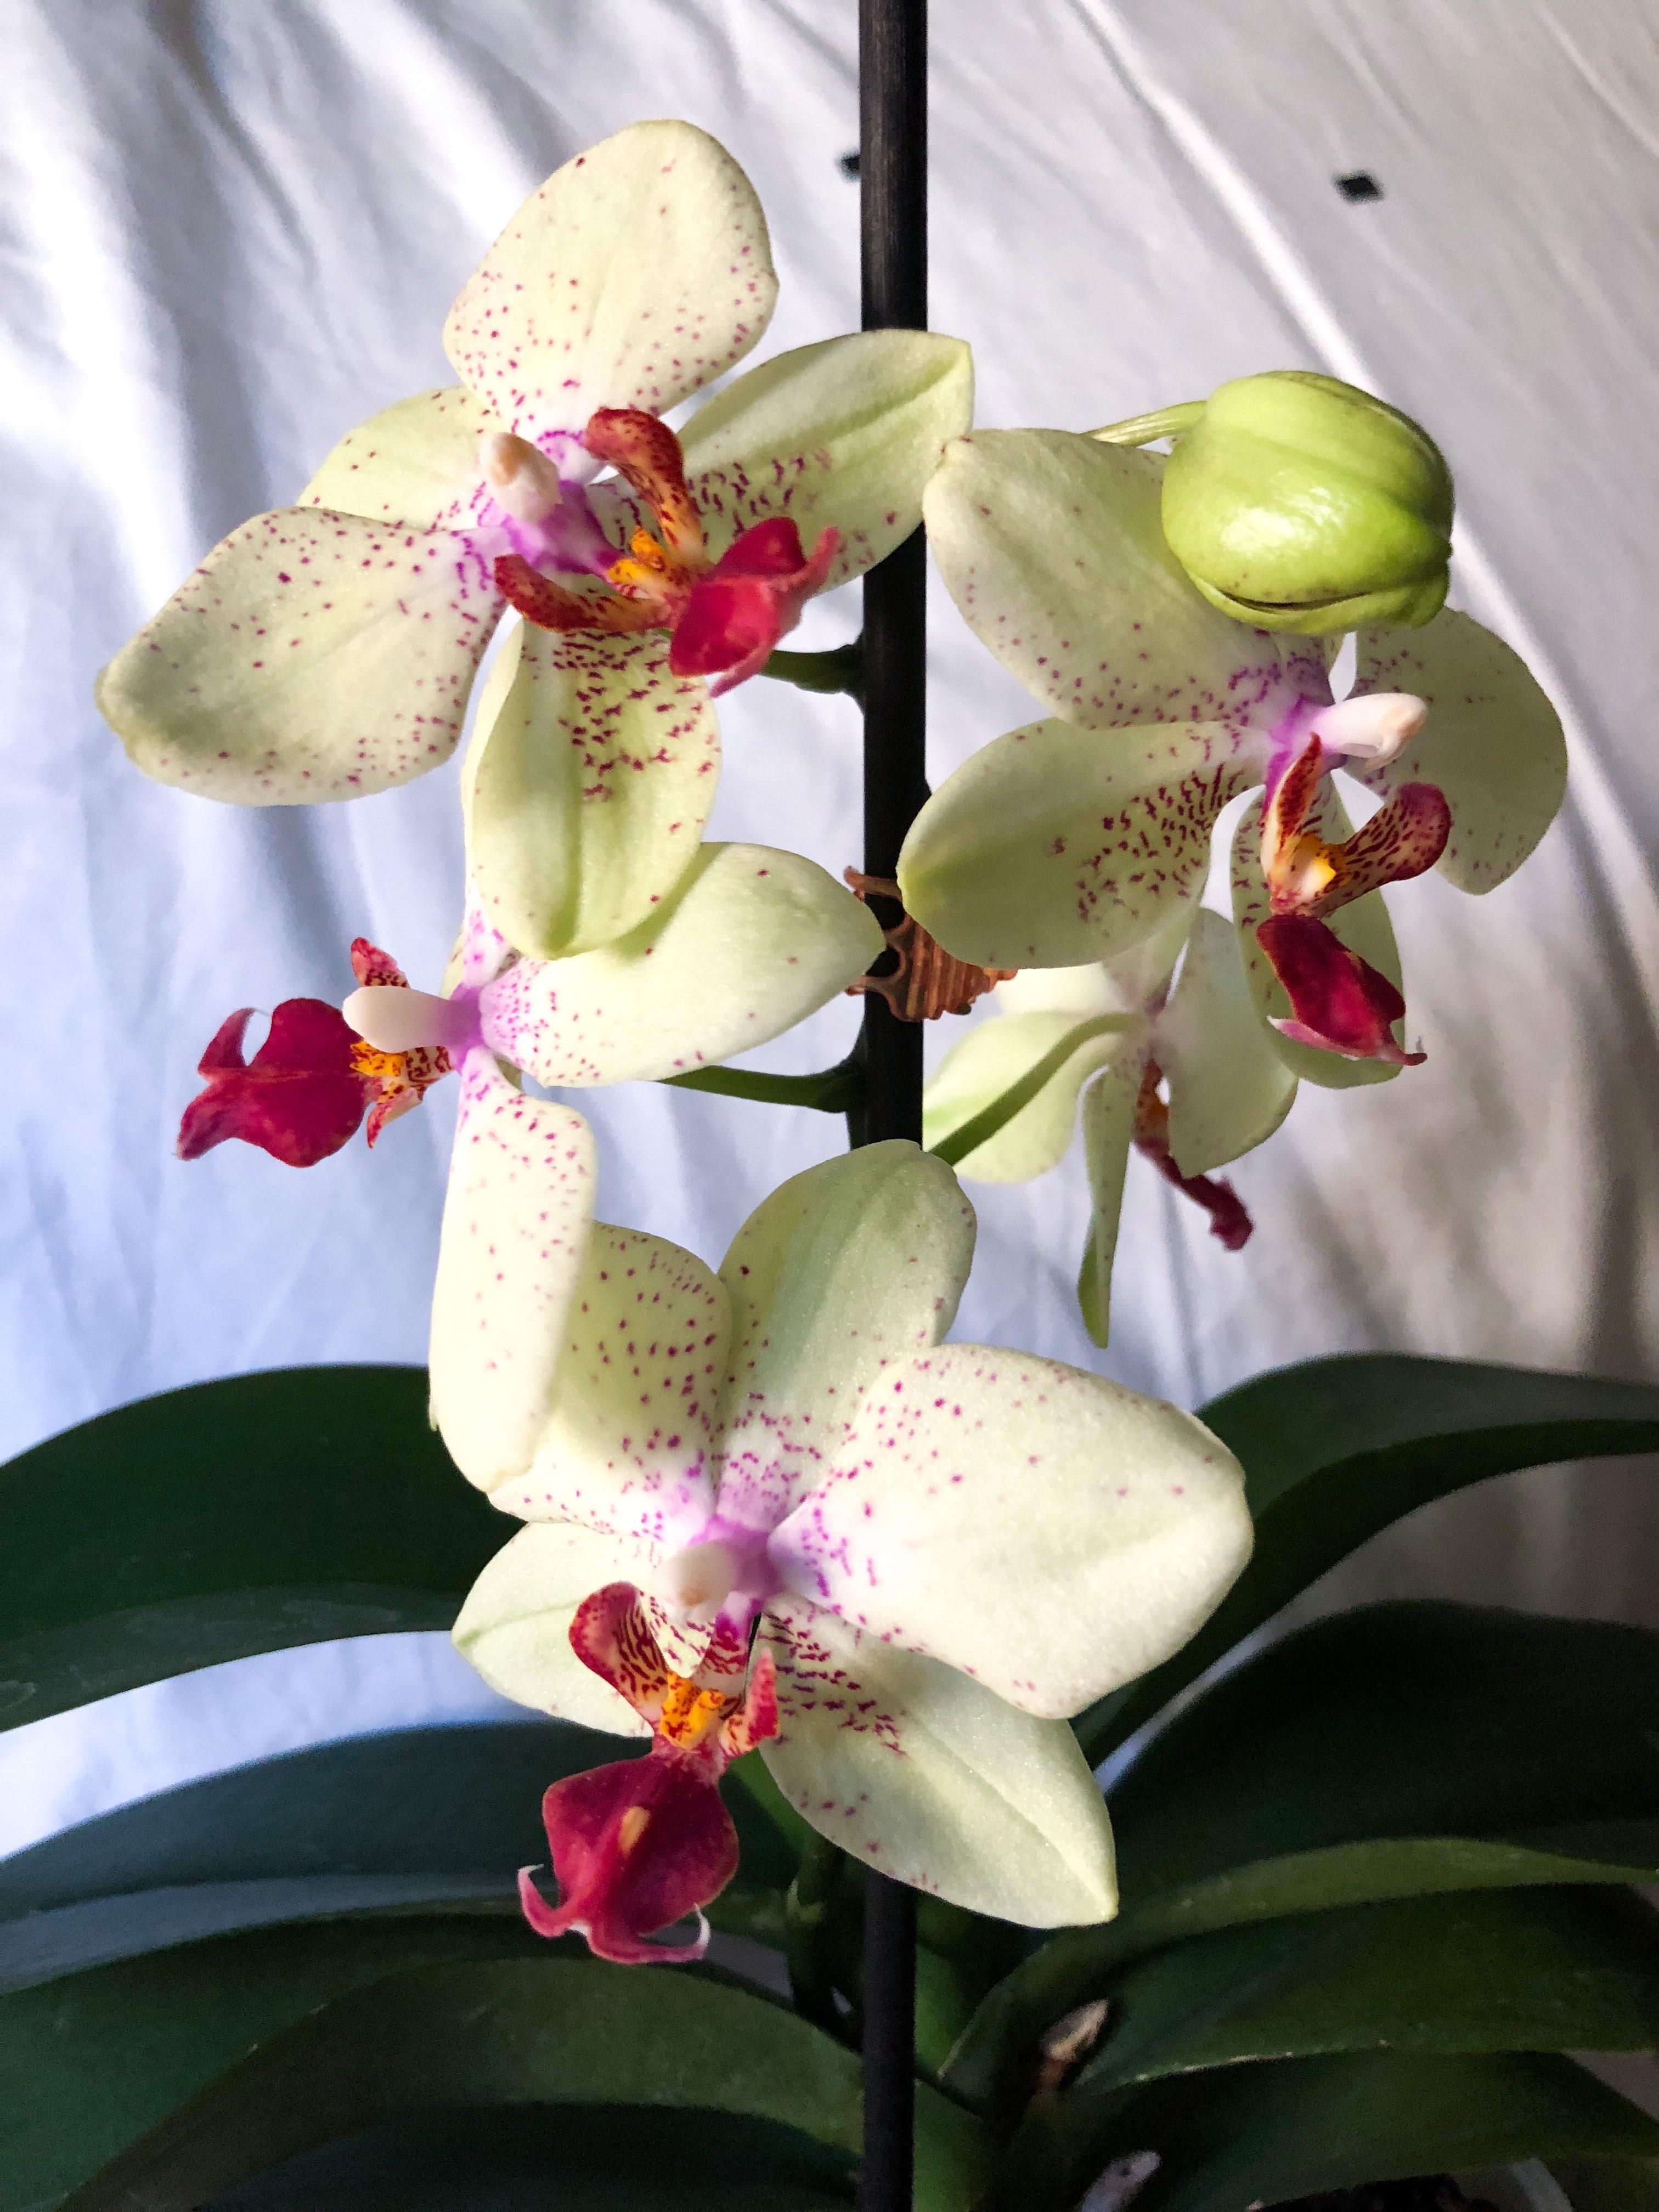 C3FB5A78 AFA4 493B A8B3 D2872D3F0DA5 - Full Metal Orchid